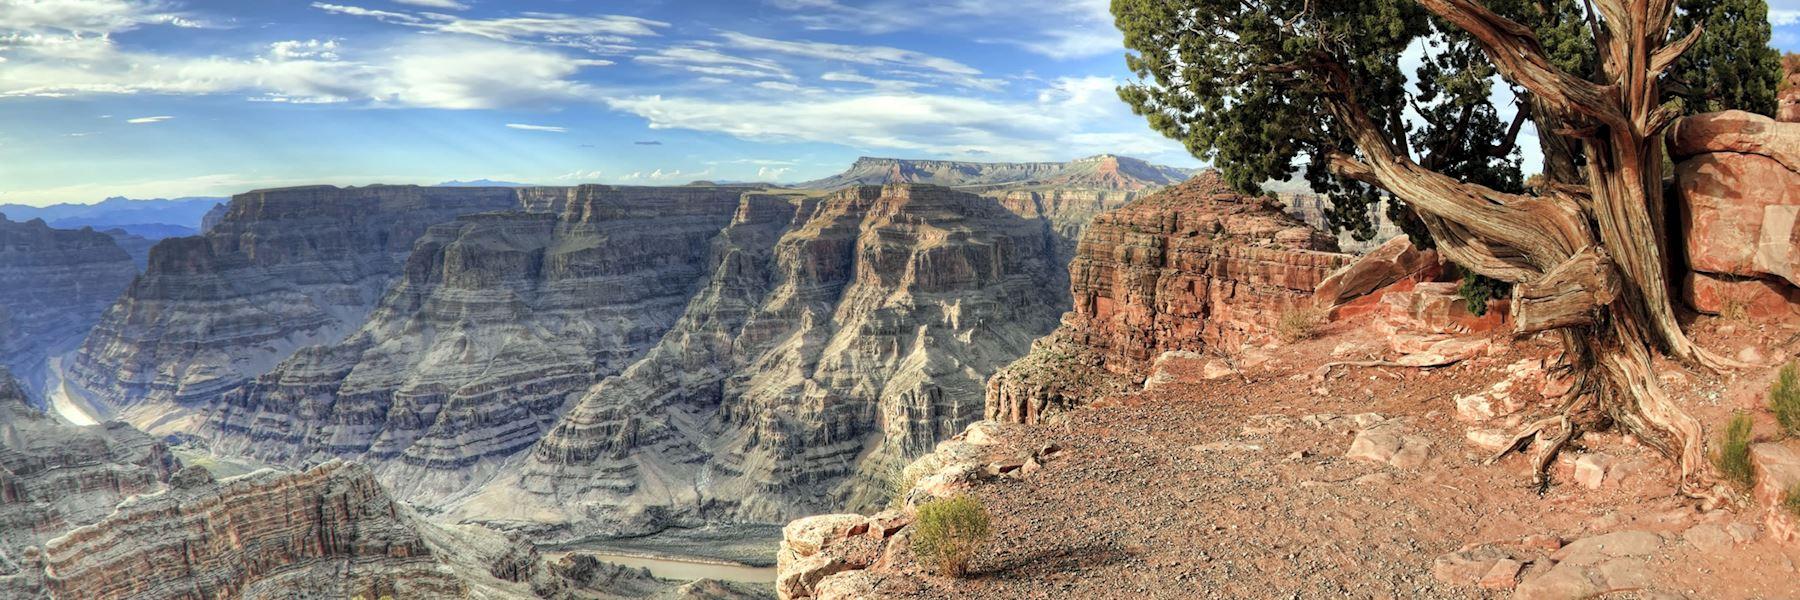 Visit Grand Canyon National Park, USA